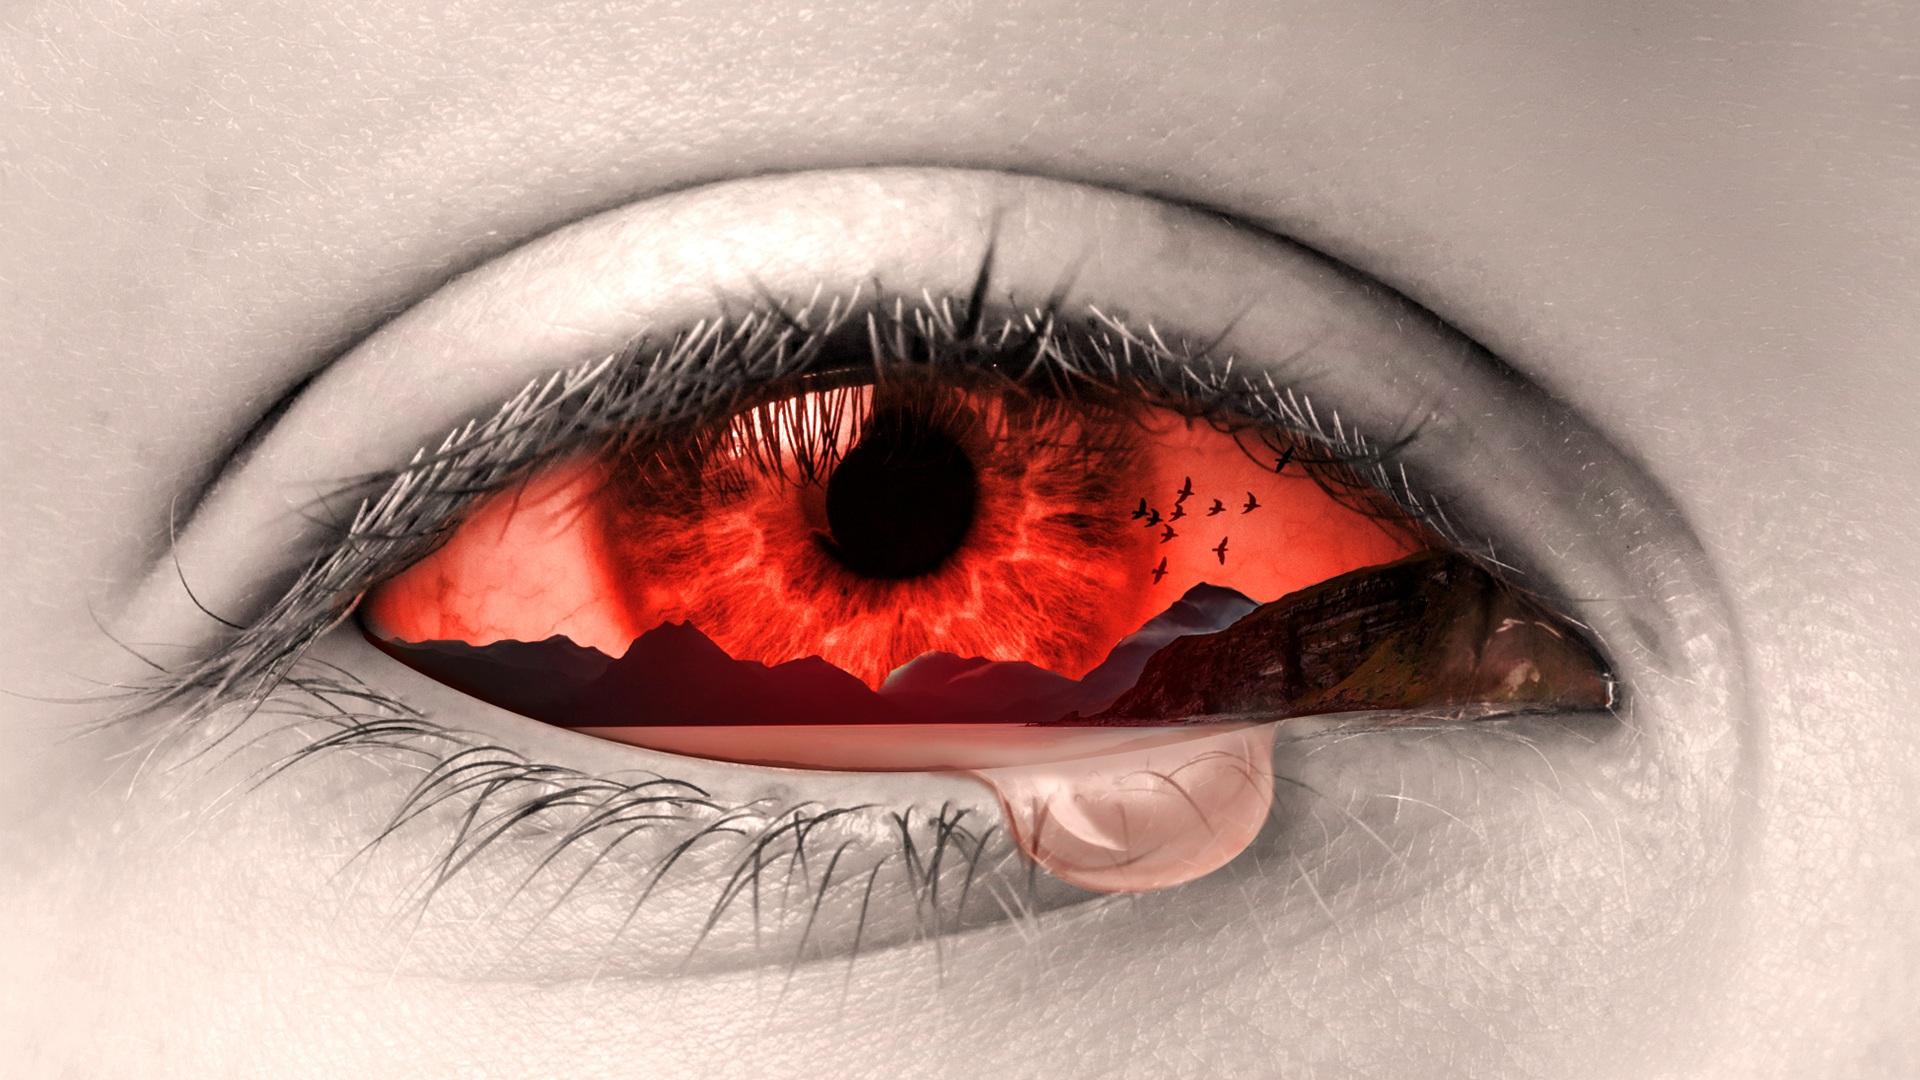 ce inseamna cand visezi ca plangi - sfatulparintilor.ro- pixabay-com - eye-2274884